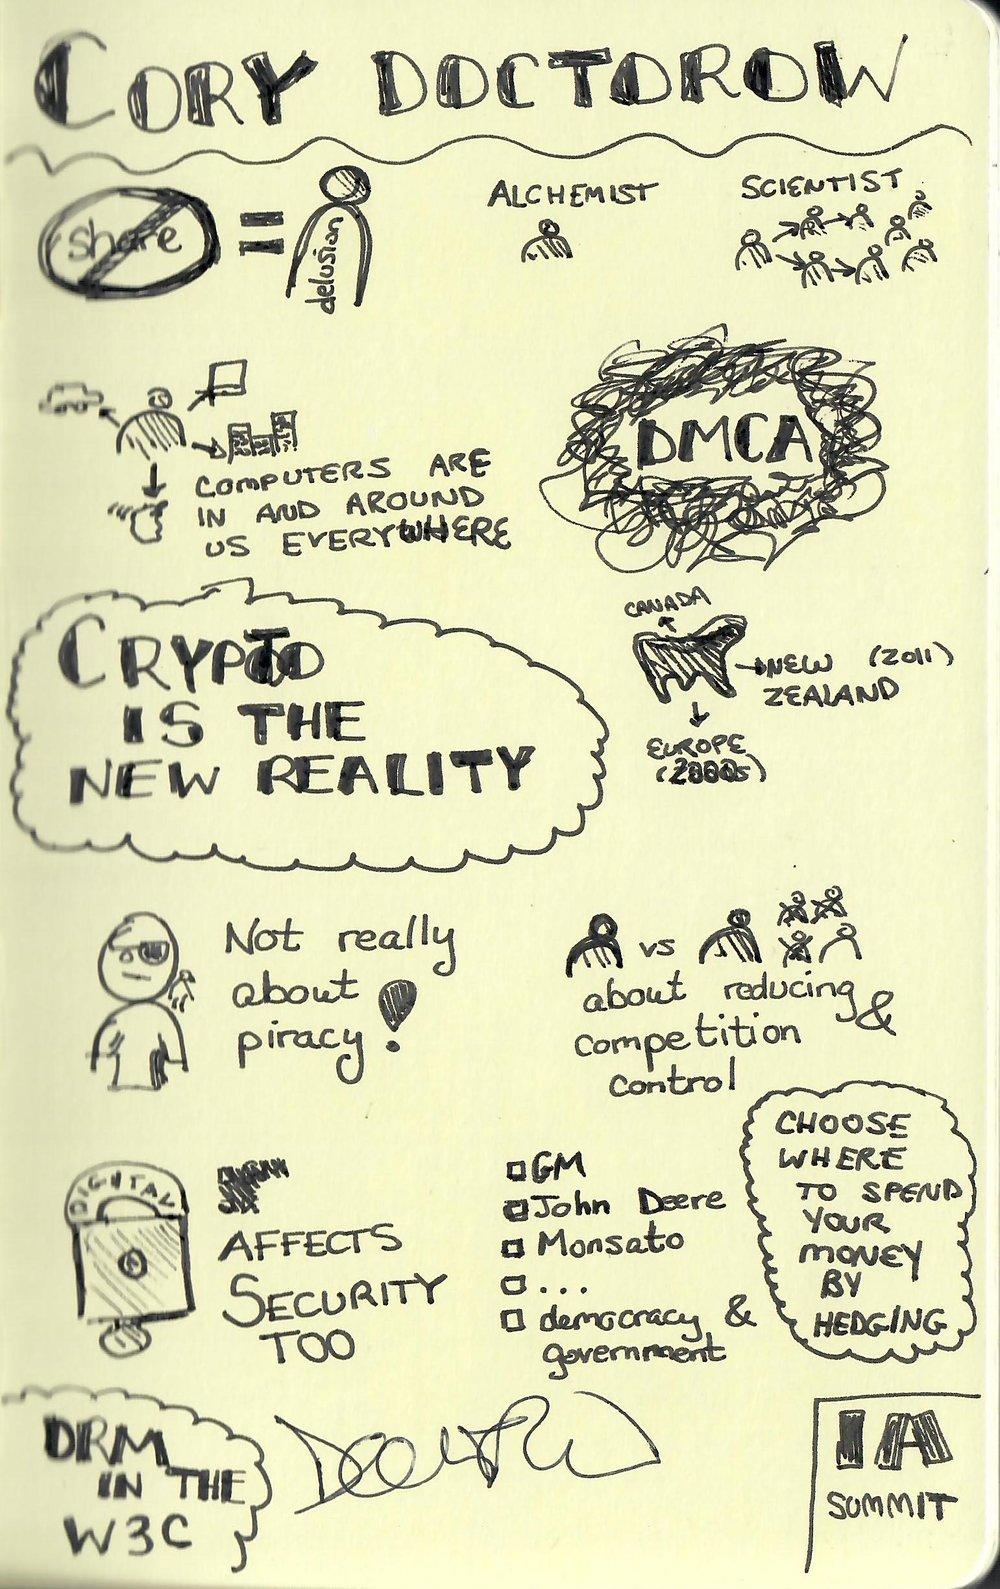 Cory Doctorow Keynote.jpg